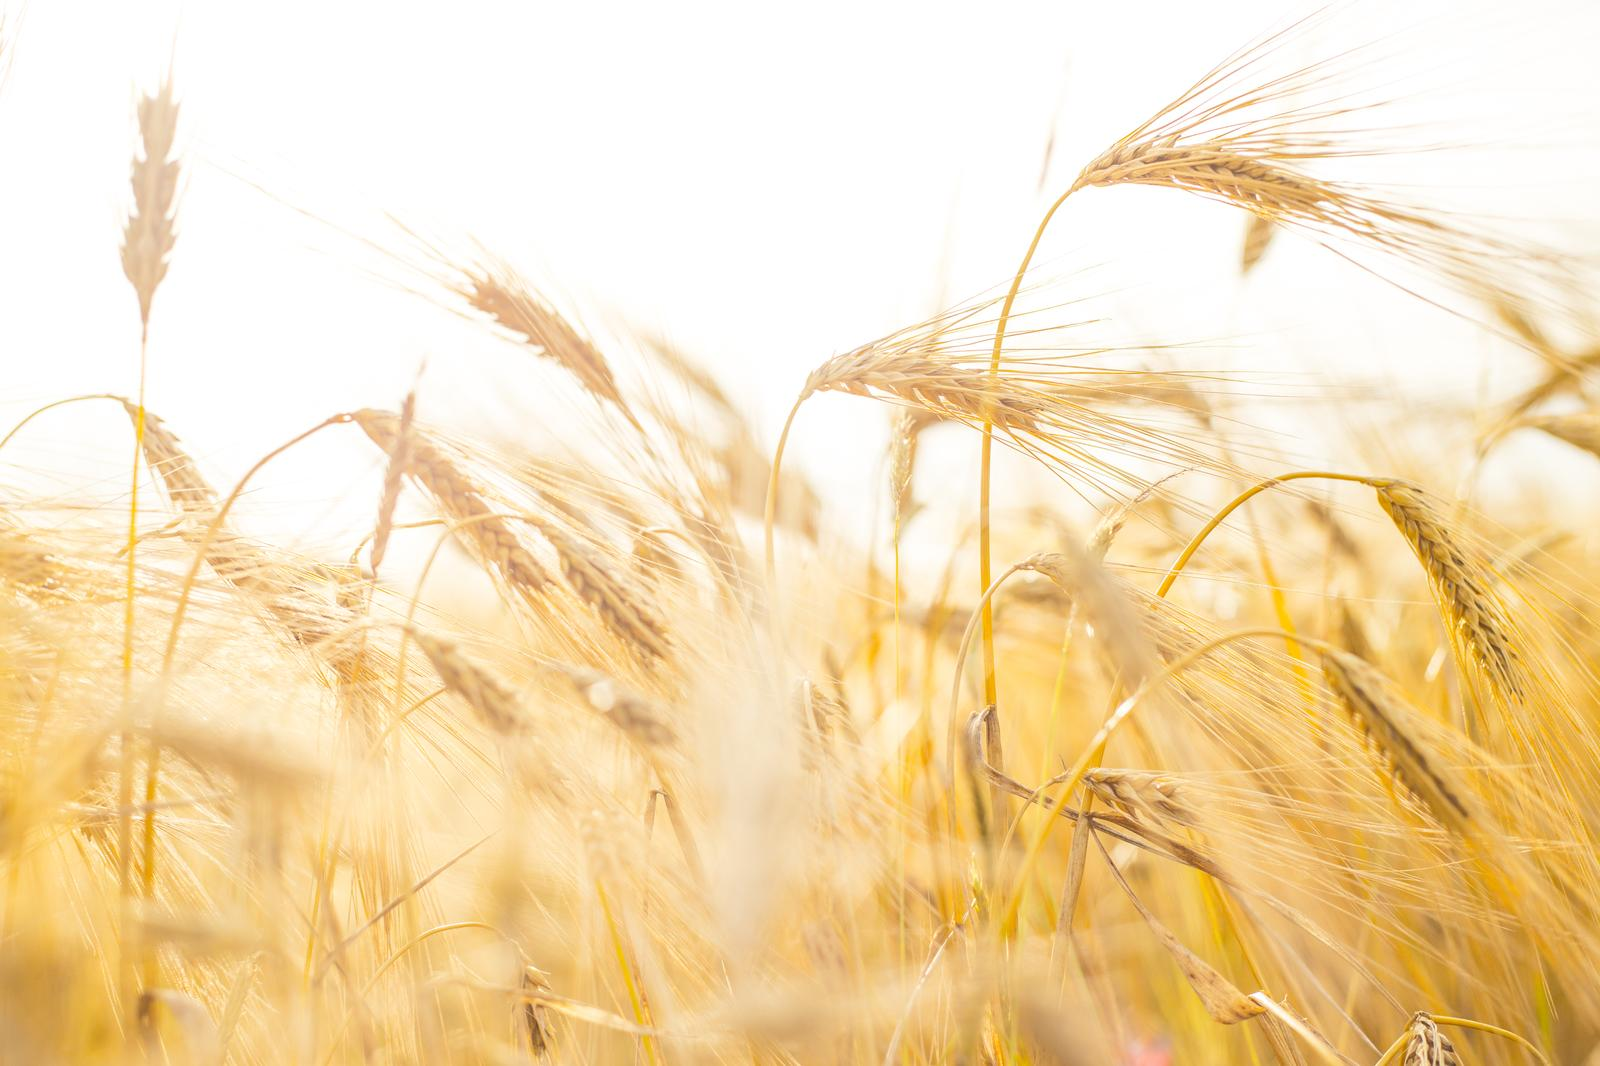 Growing of cereals (except rice), leguminous crops and oil seeds in Ida-Viru county